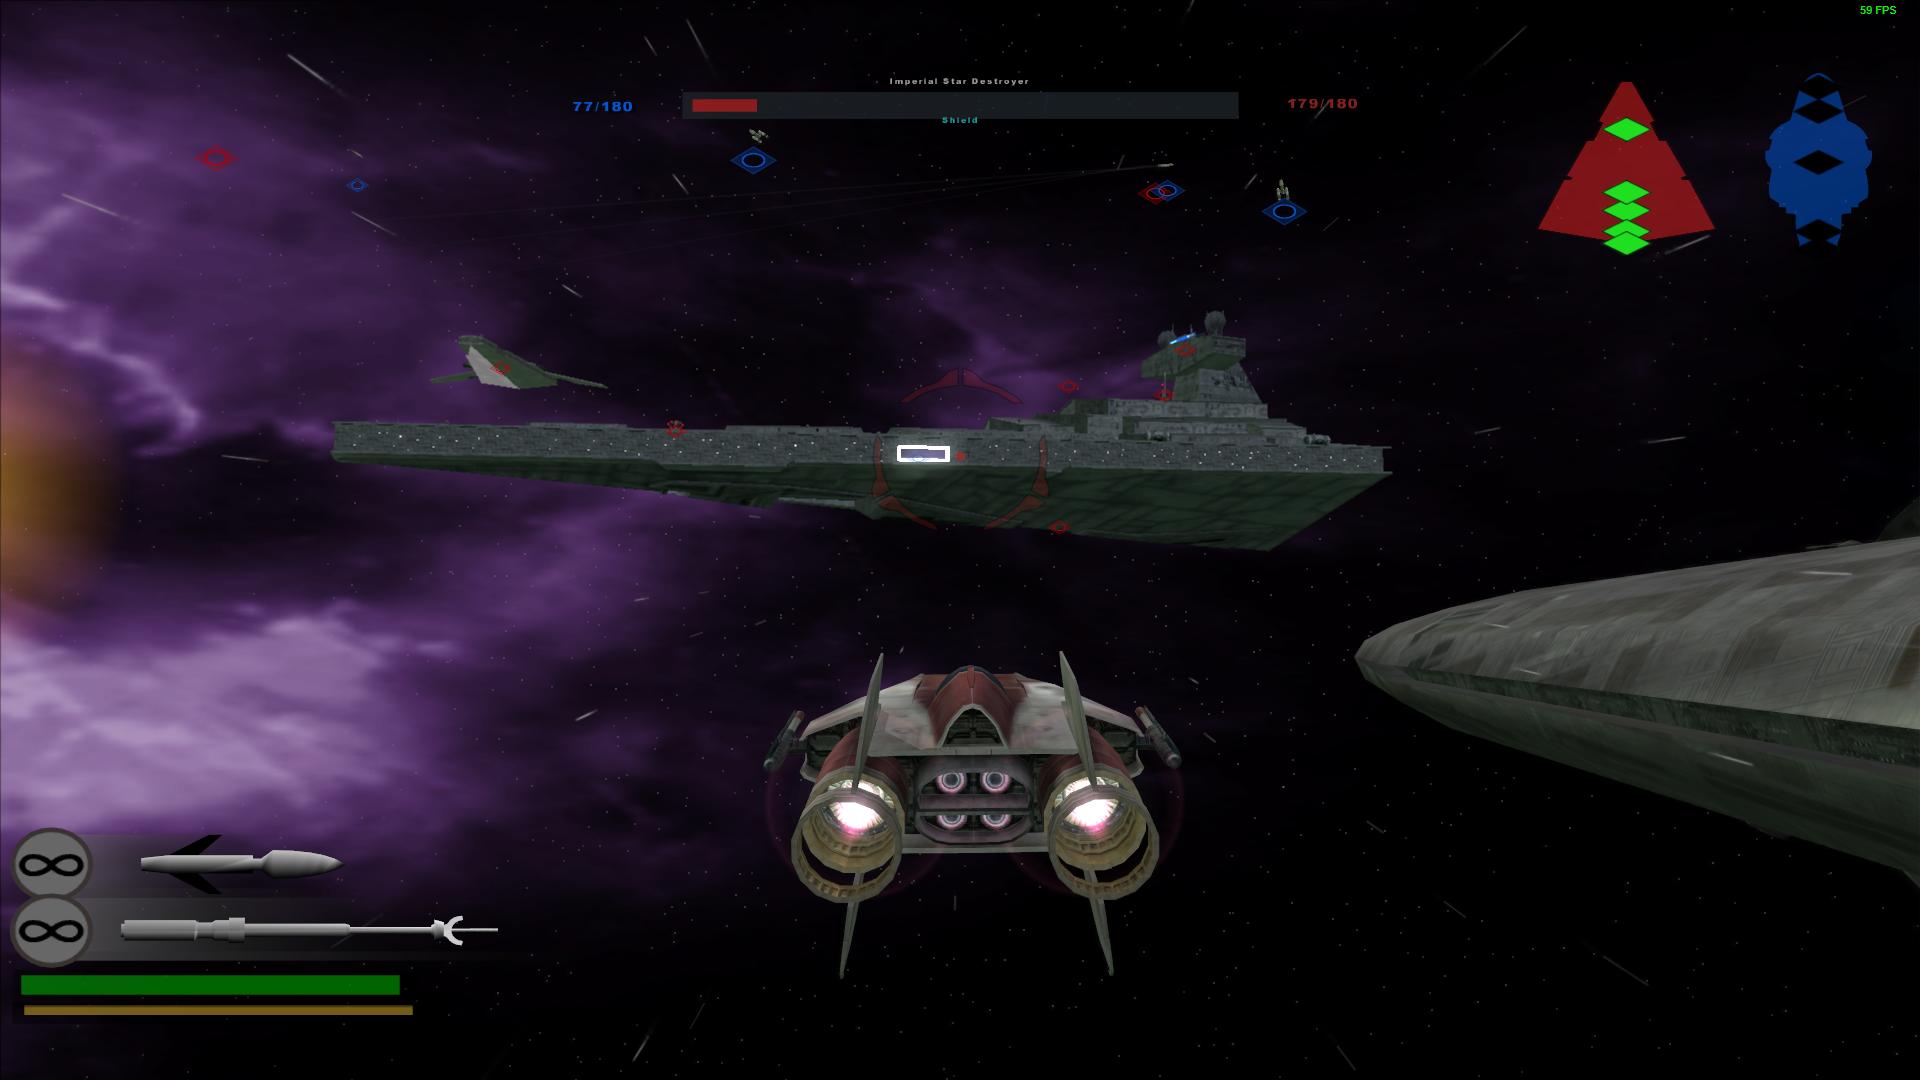 Star Wars: Battlefront II, Pandemic Studios, LucasArts, 2005